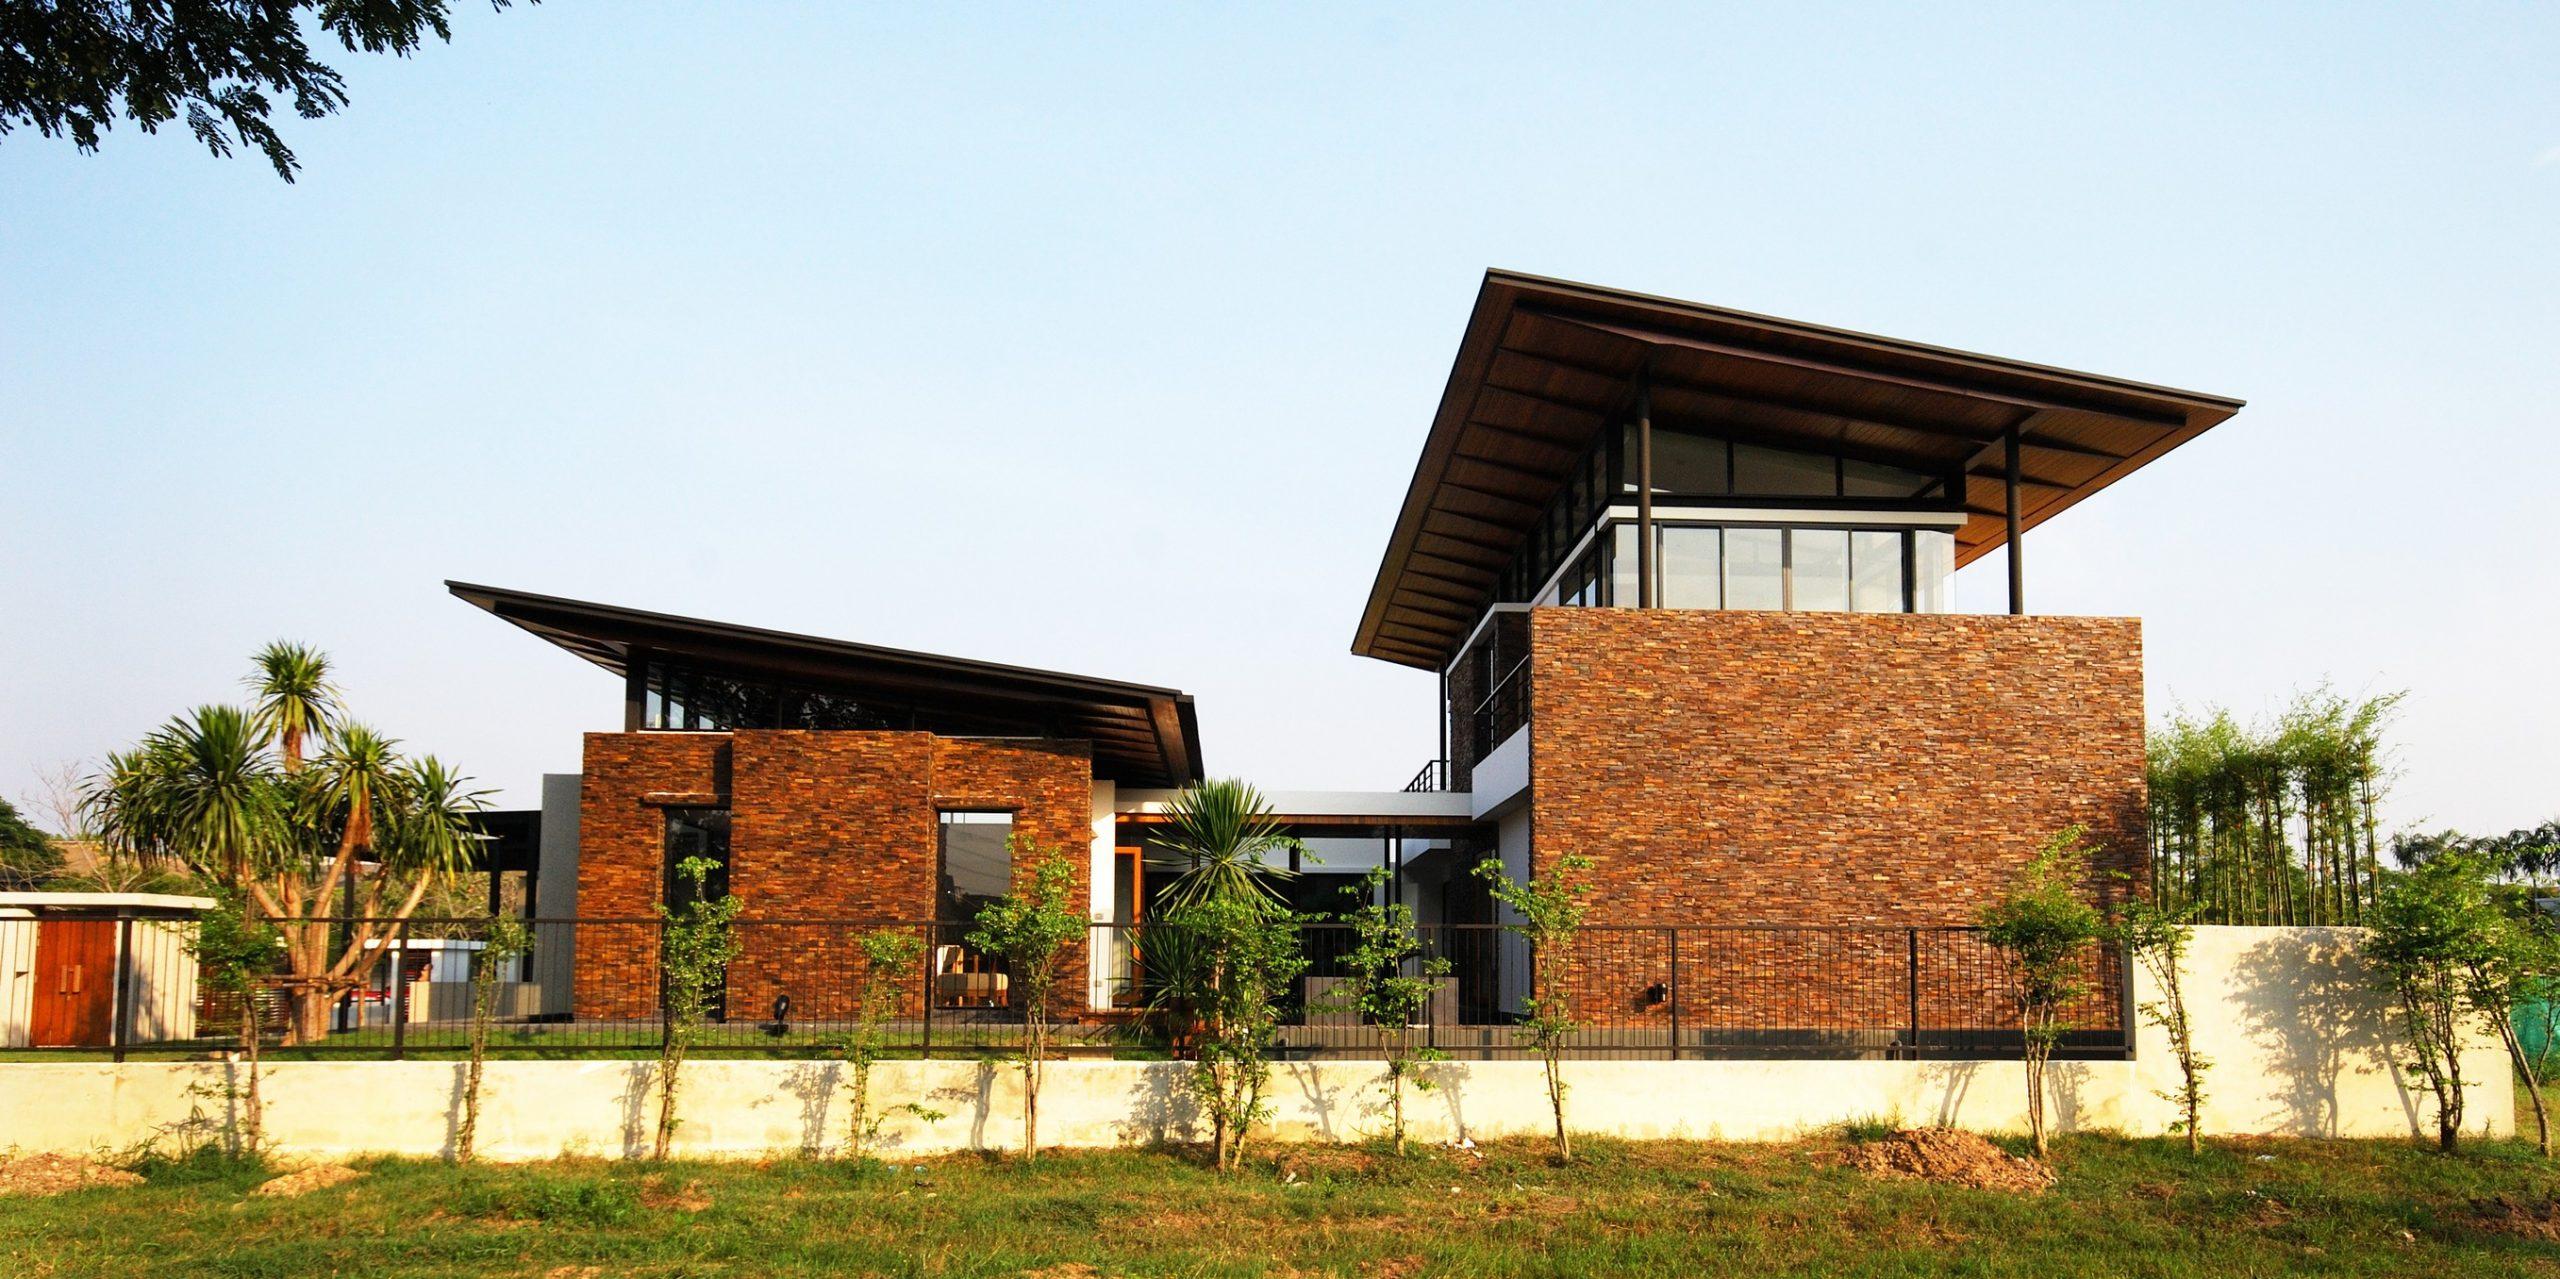 nature house design Home Design Get Nature House Design Images